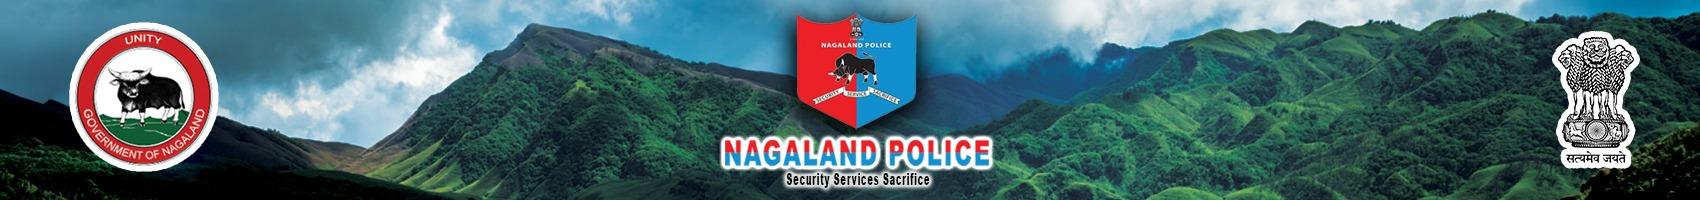 Nagaland Police Headquarters